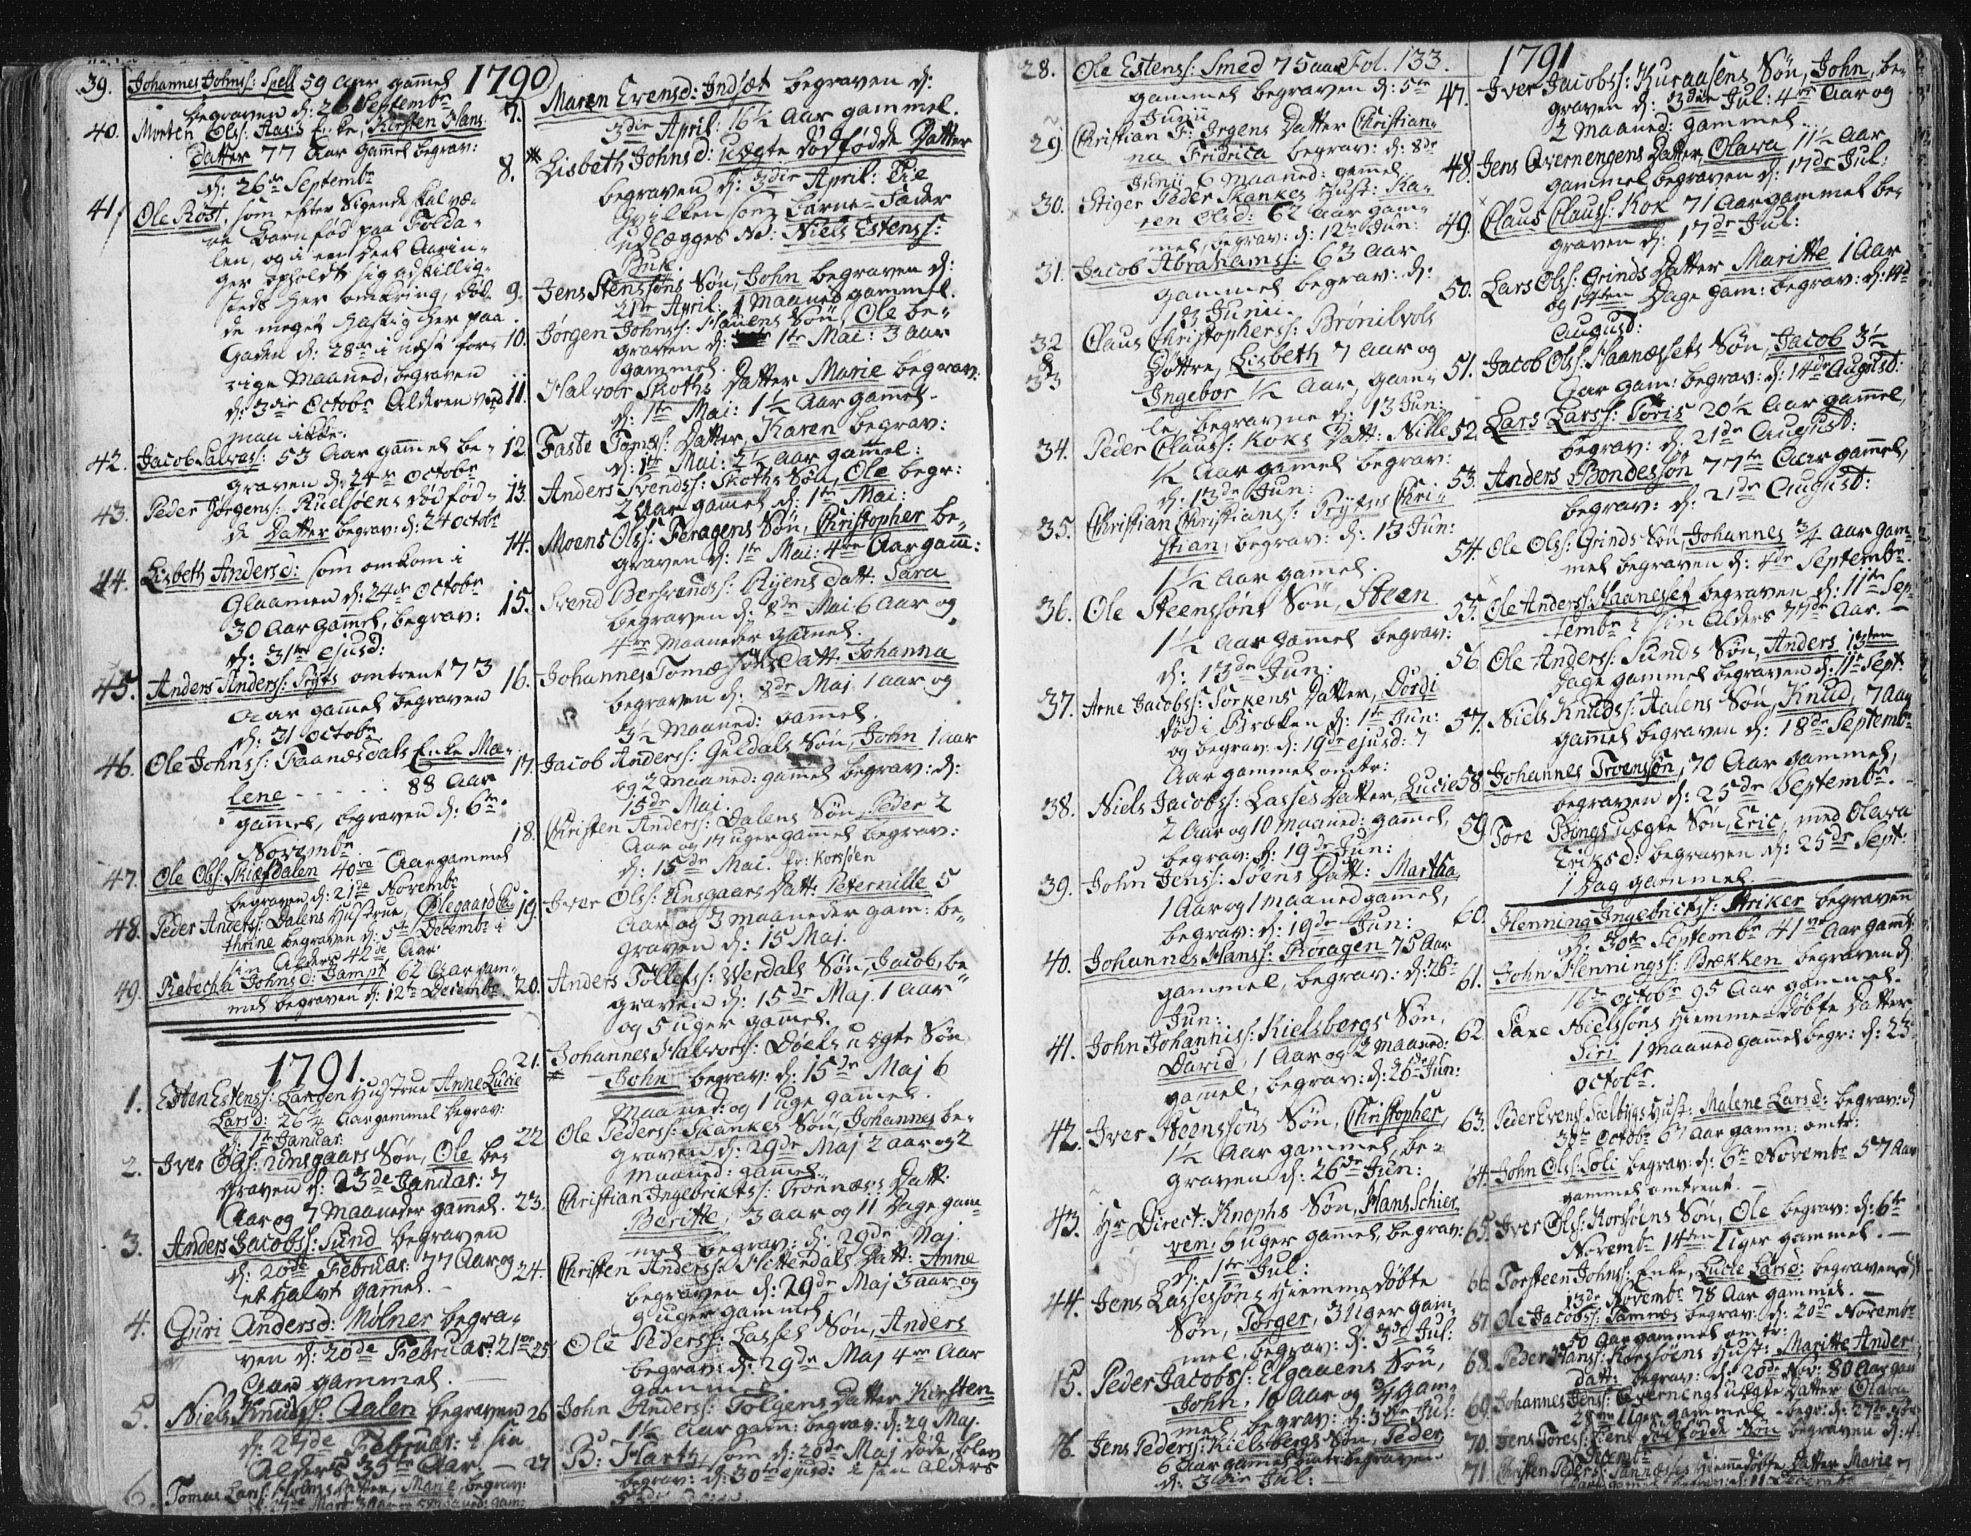 SAT, Ministerialprotokoller, klokkerbøker og fødselsregistre - Sør-Trøndelag, 681/L0926: Parish register (official) no. 681A04, 1767-1797, p. 133